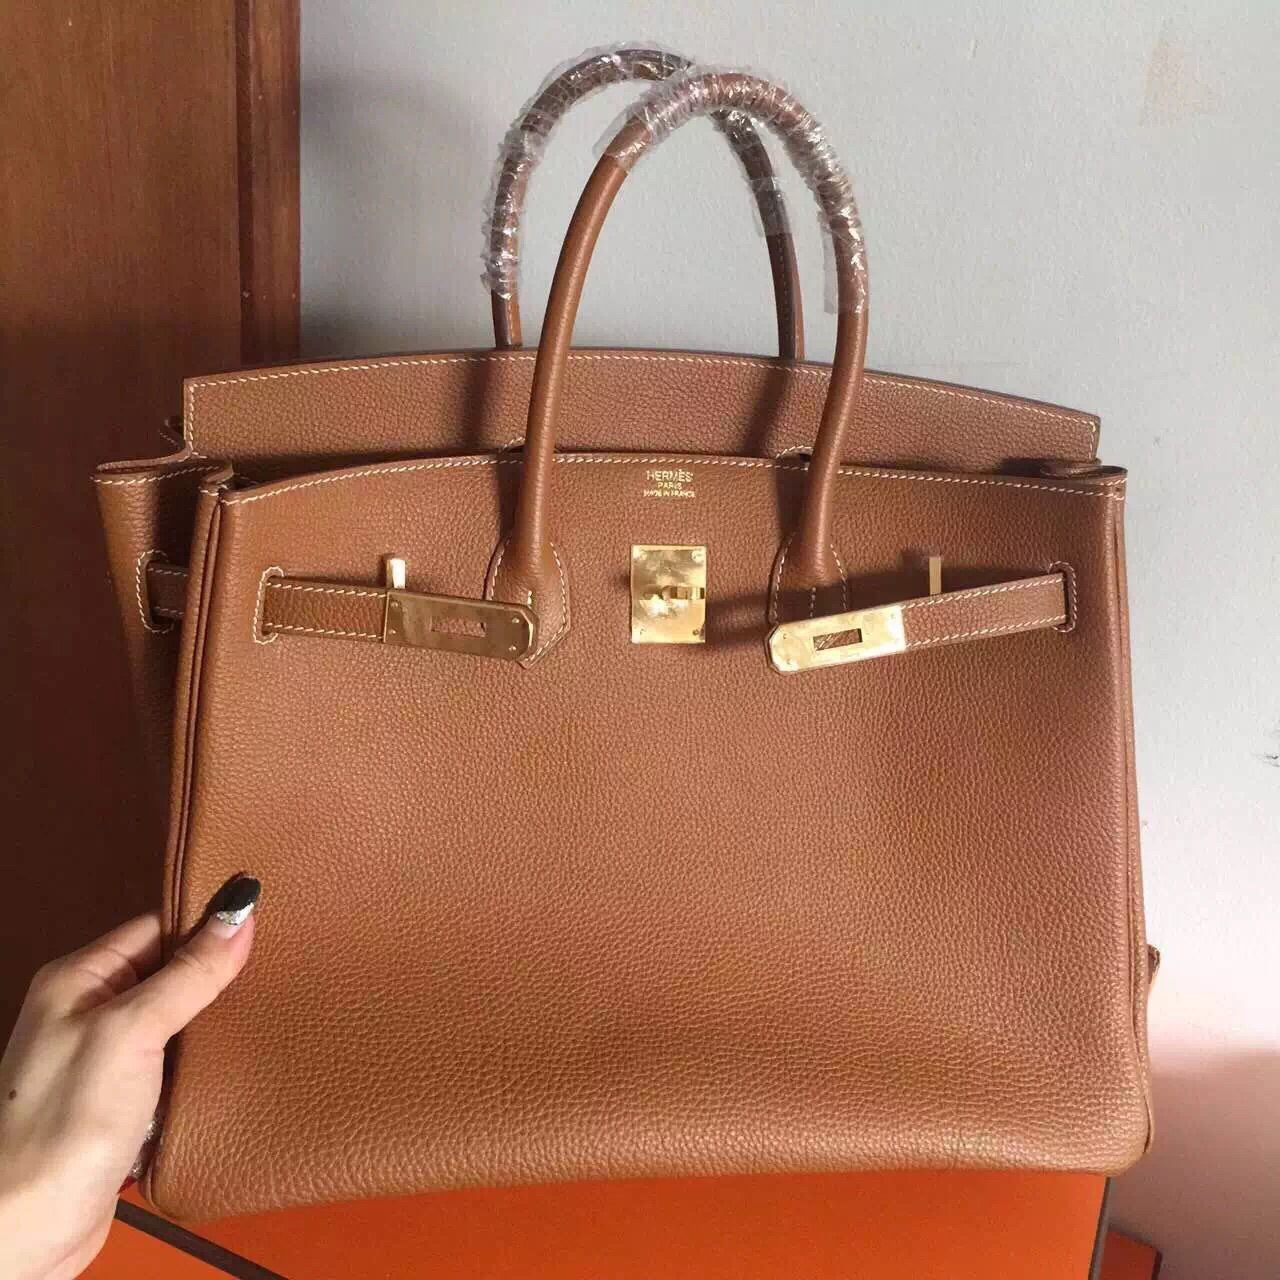 6c6a6ba41db8 Hermes bag